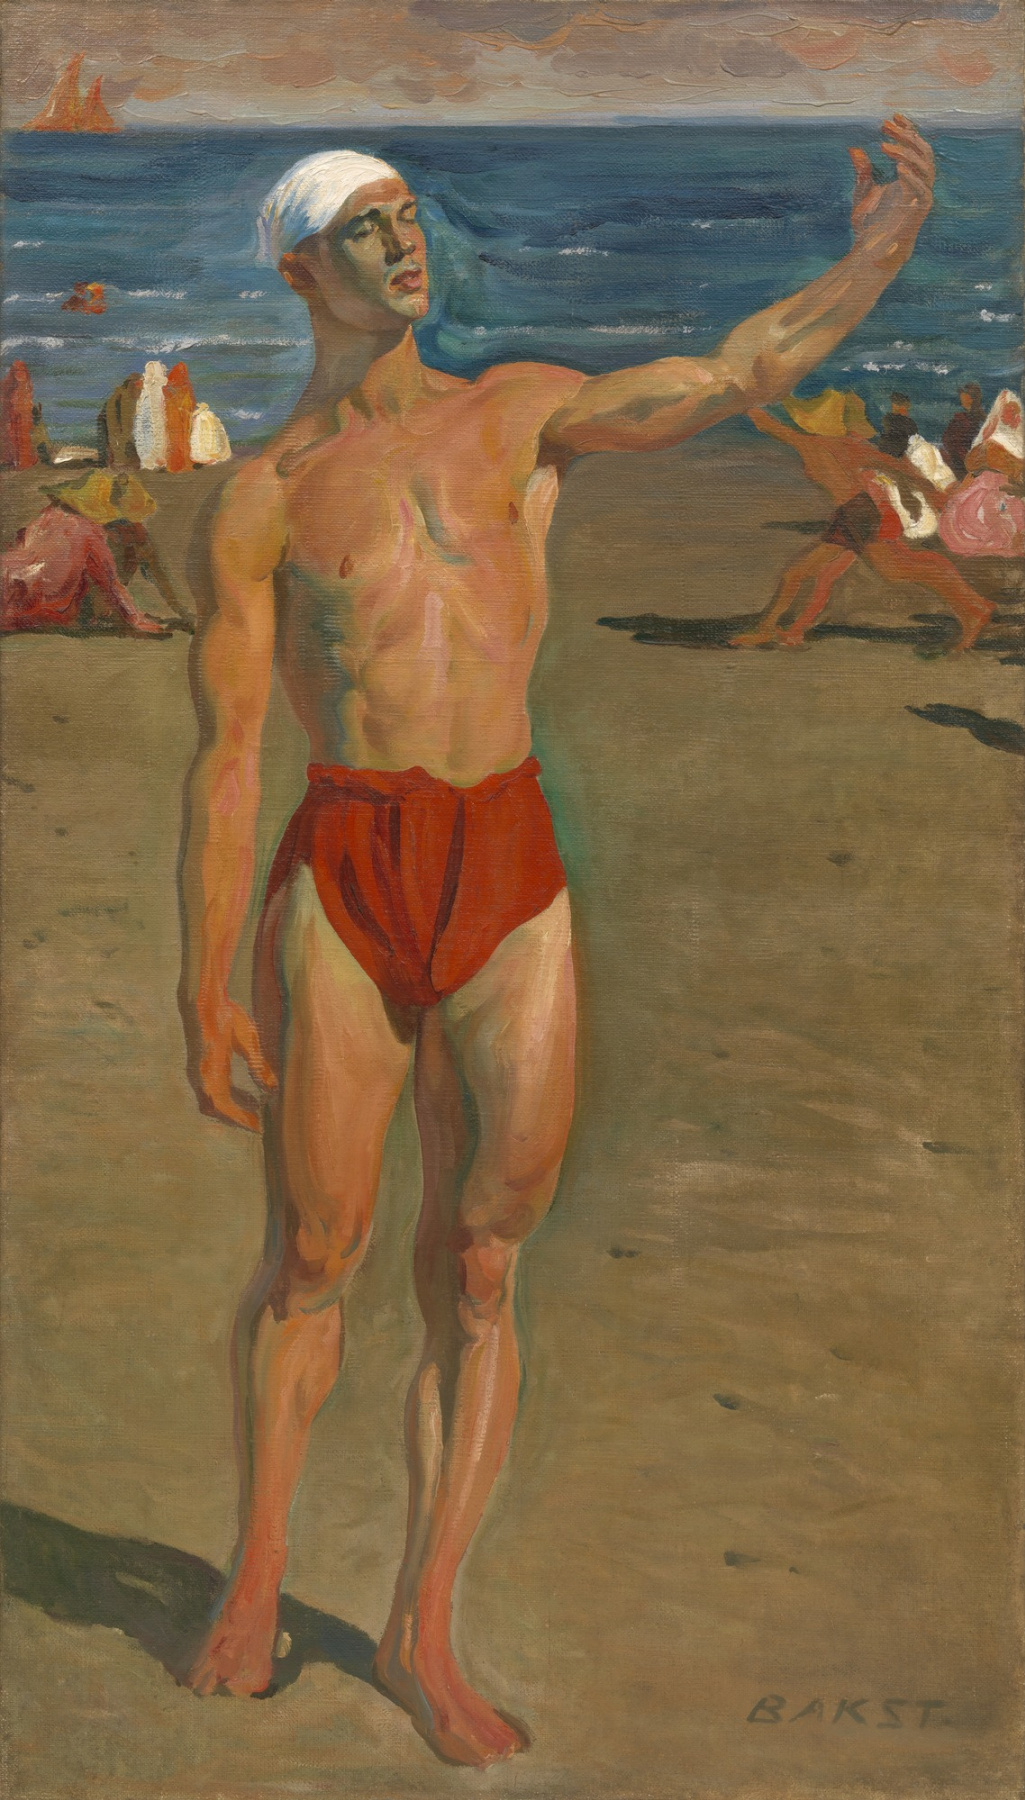 Lev (Leon) Bakst. Vaslav Nijinsky